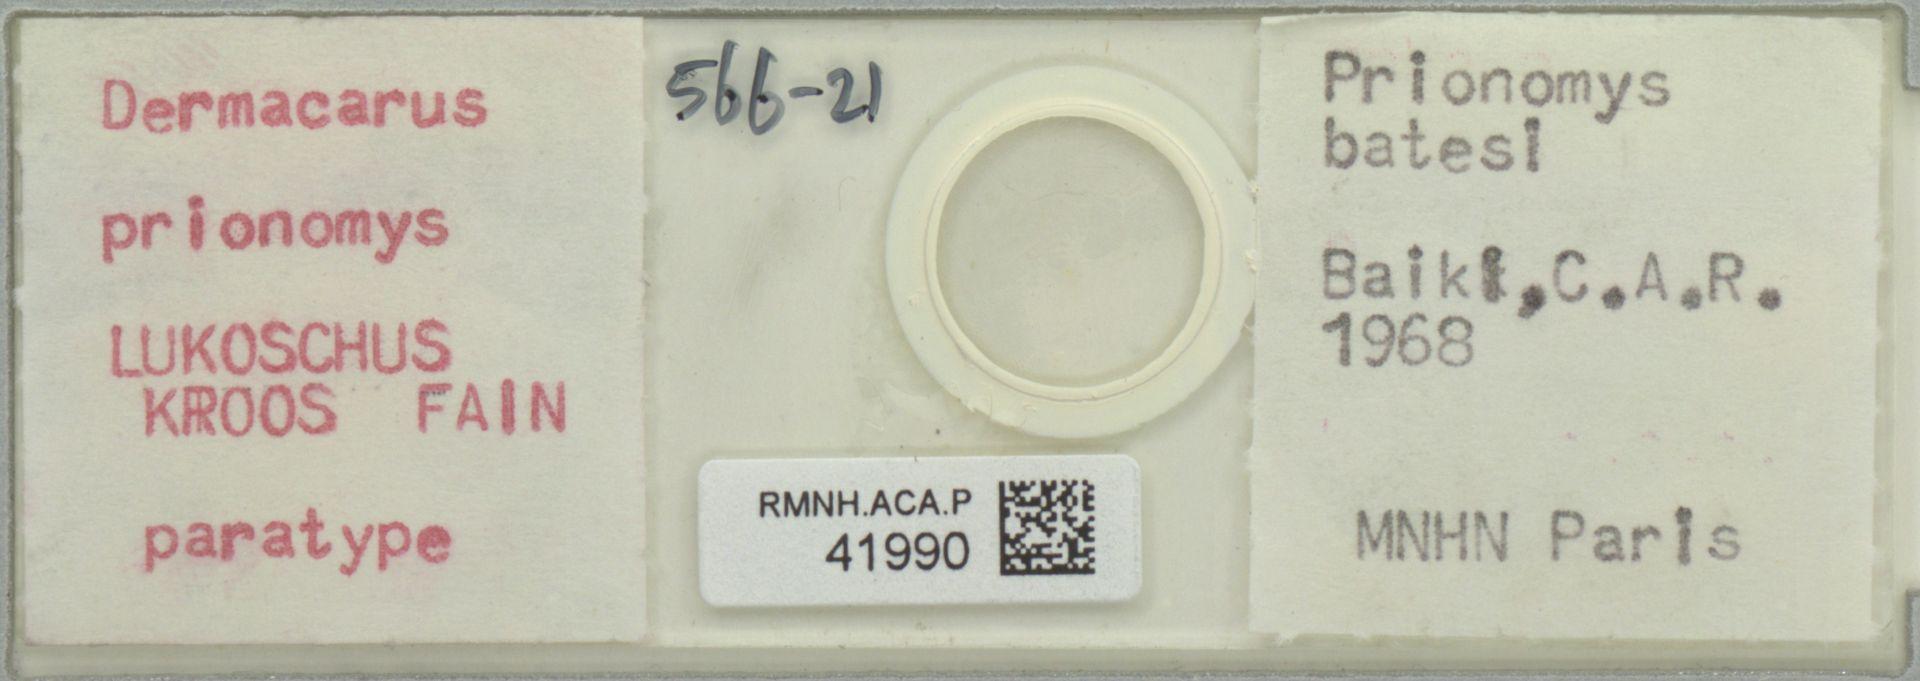 RMNH.ACA.P.41990 | Dermacarus prionomys Lukoschus, Kroos, Fain